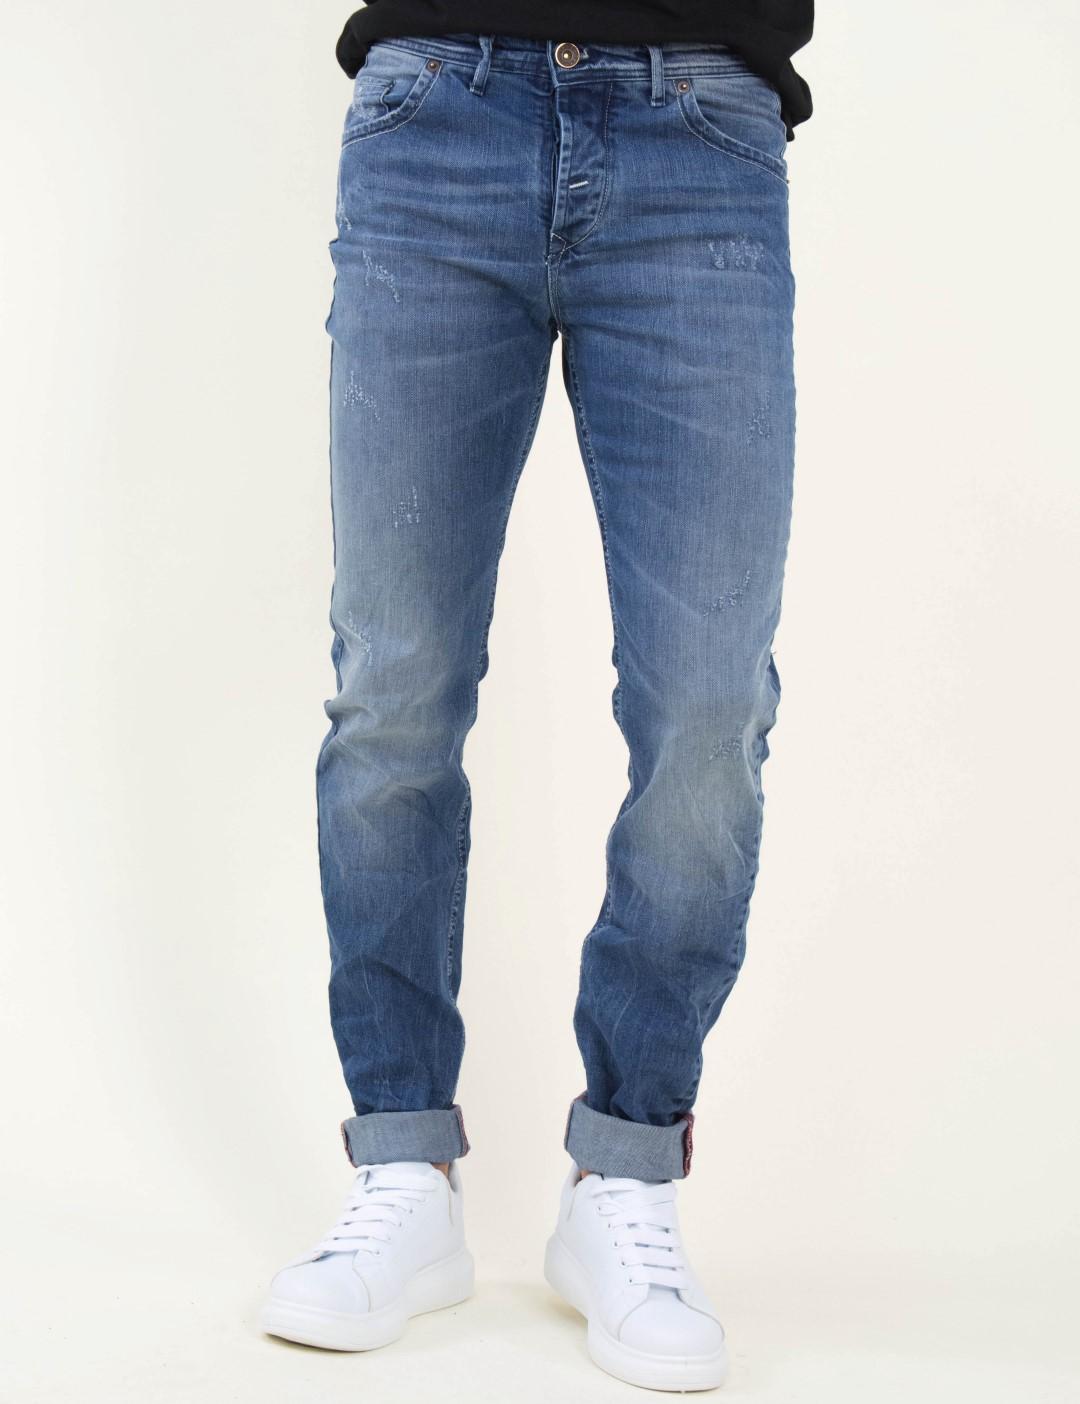 f83a553c2398 Ανδρικό μπλε τζιν παντελόνι φθορές Trial 19matthew